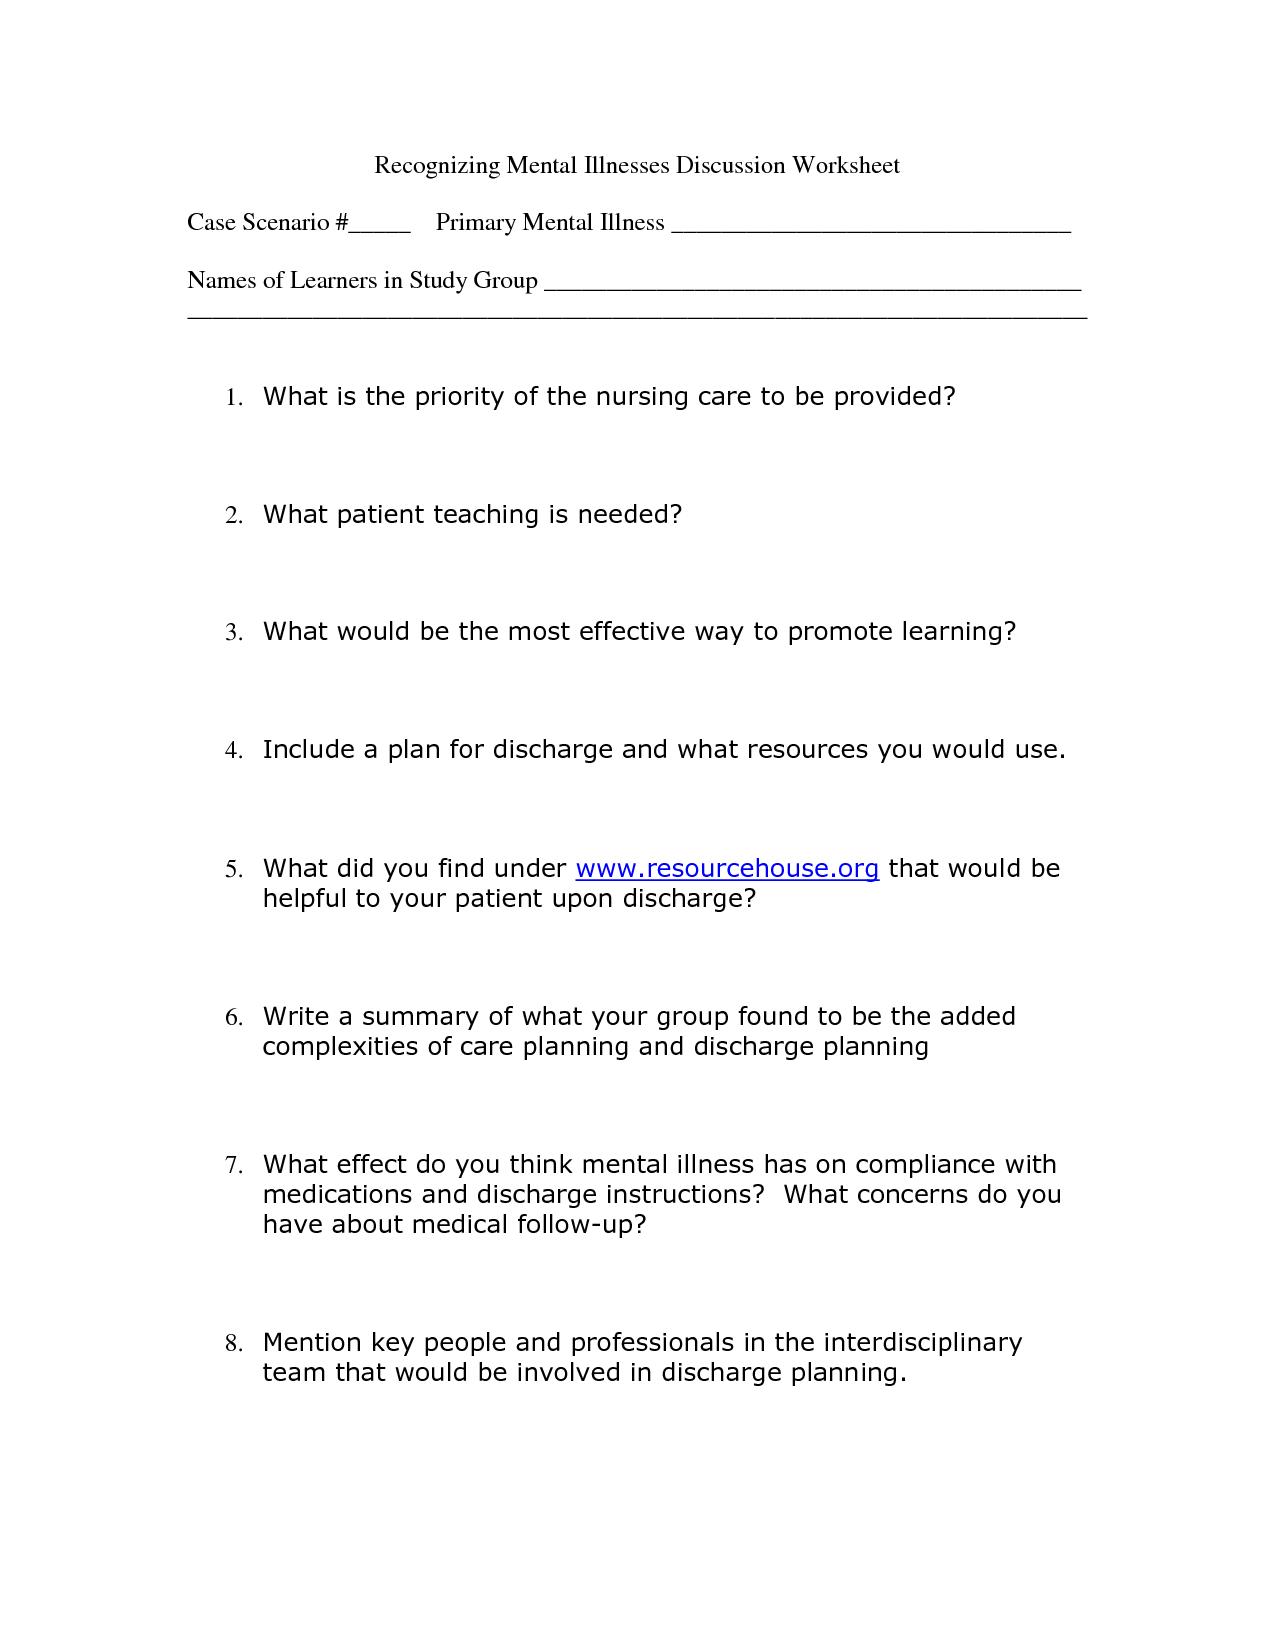 7 Best Images of Free Mental Health Worksheets Printable ...